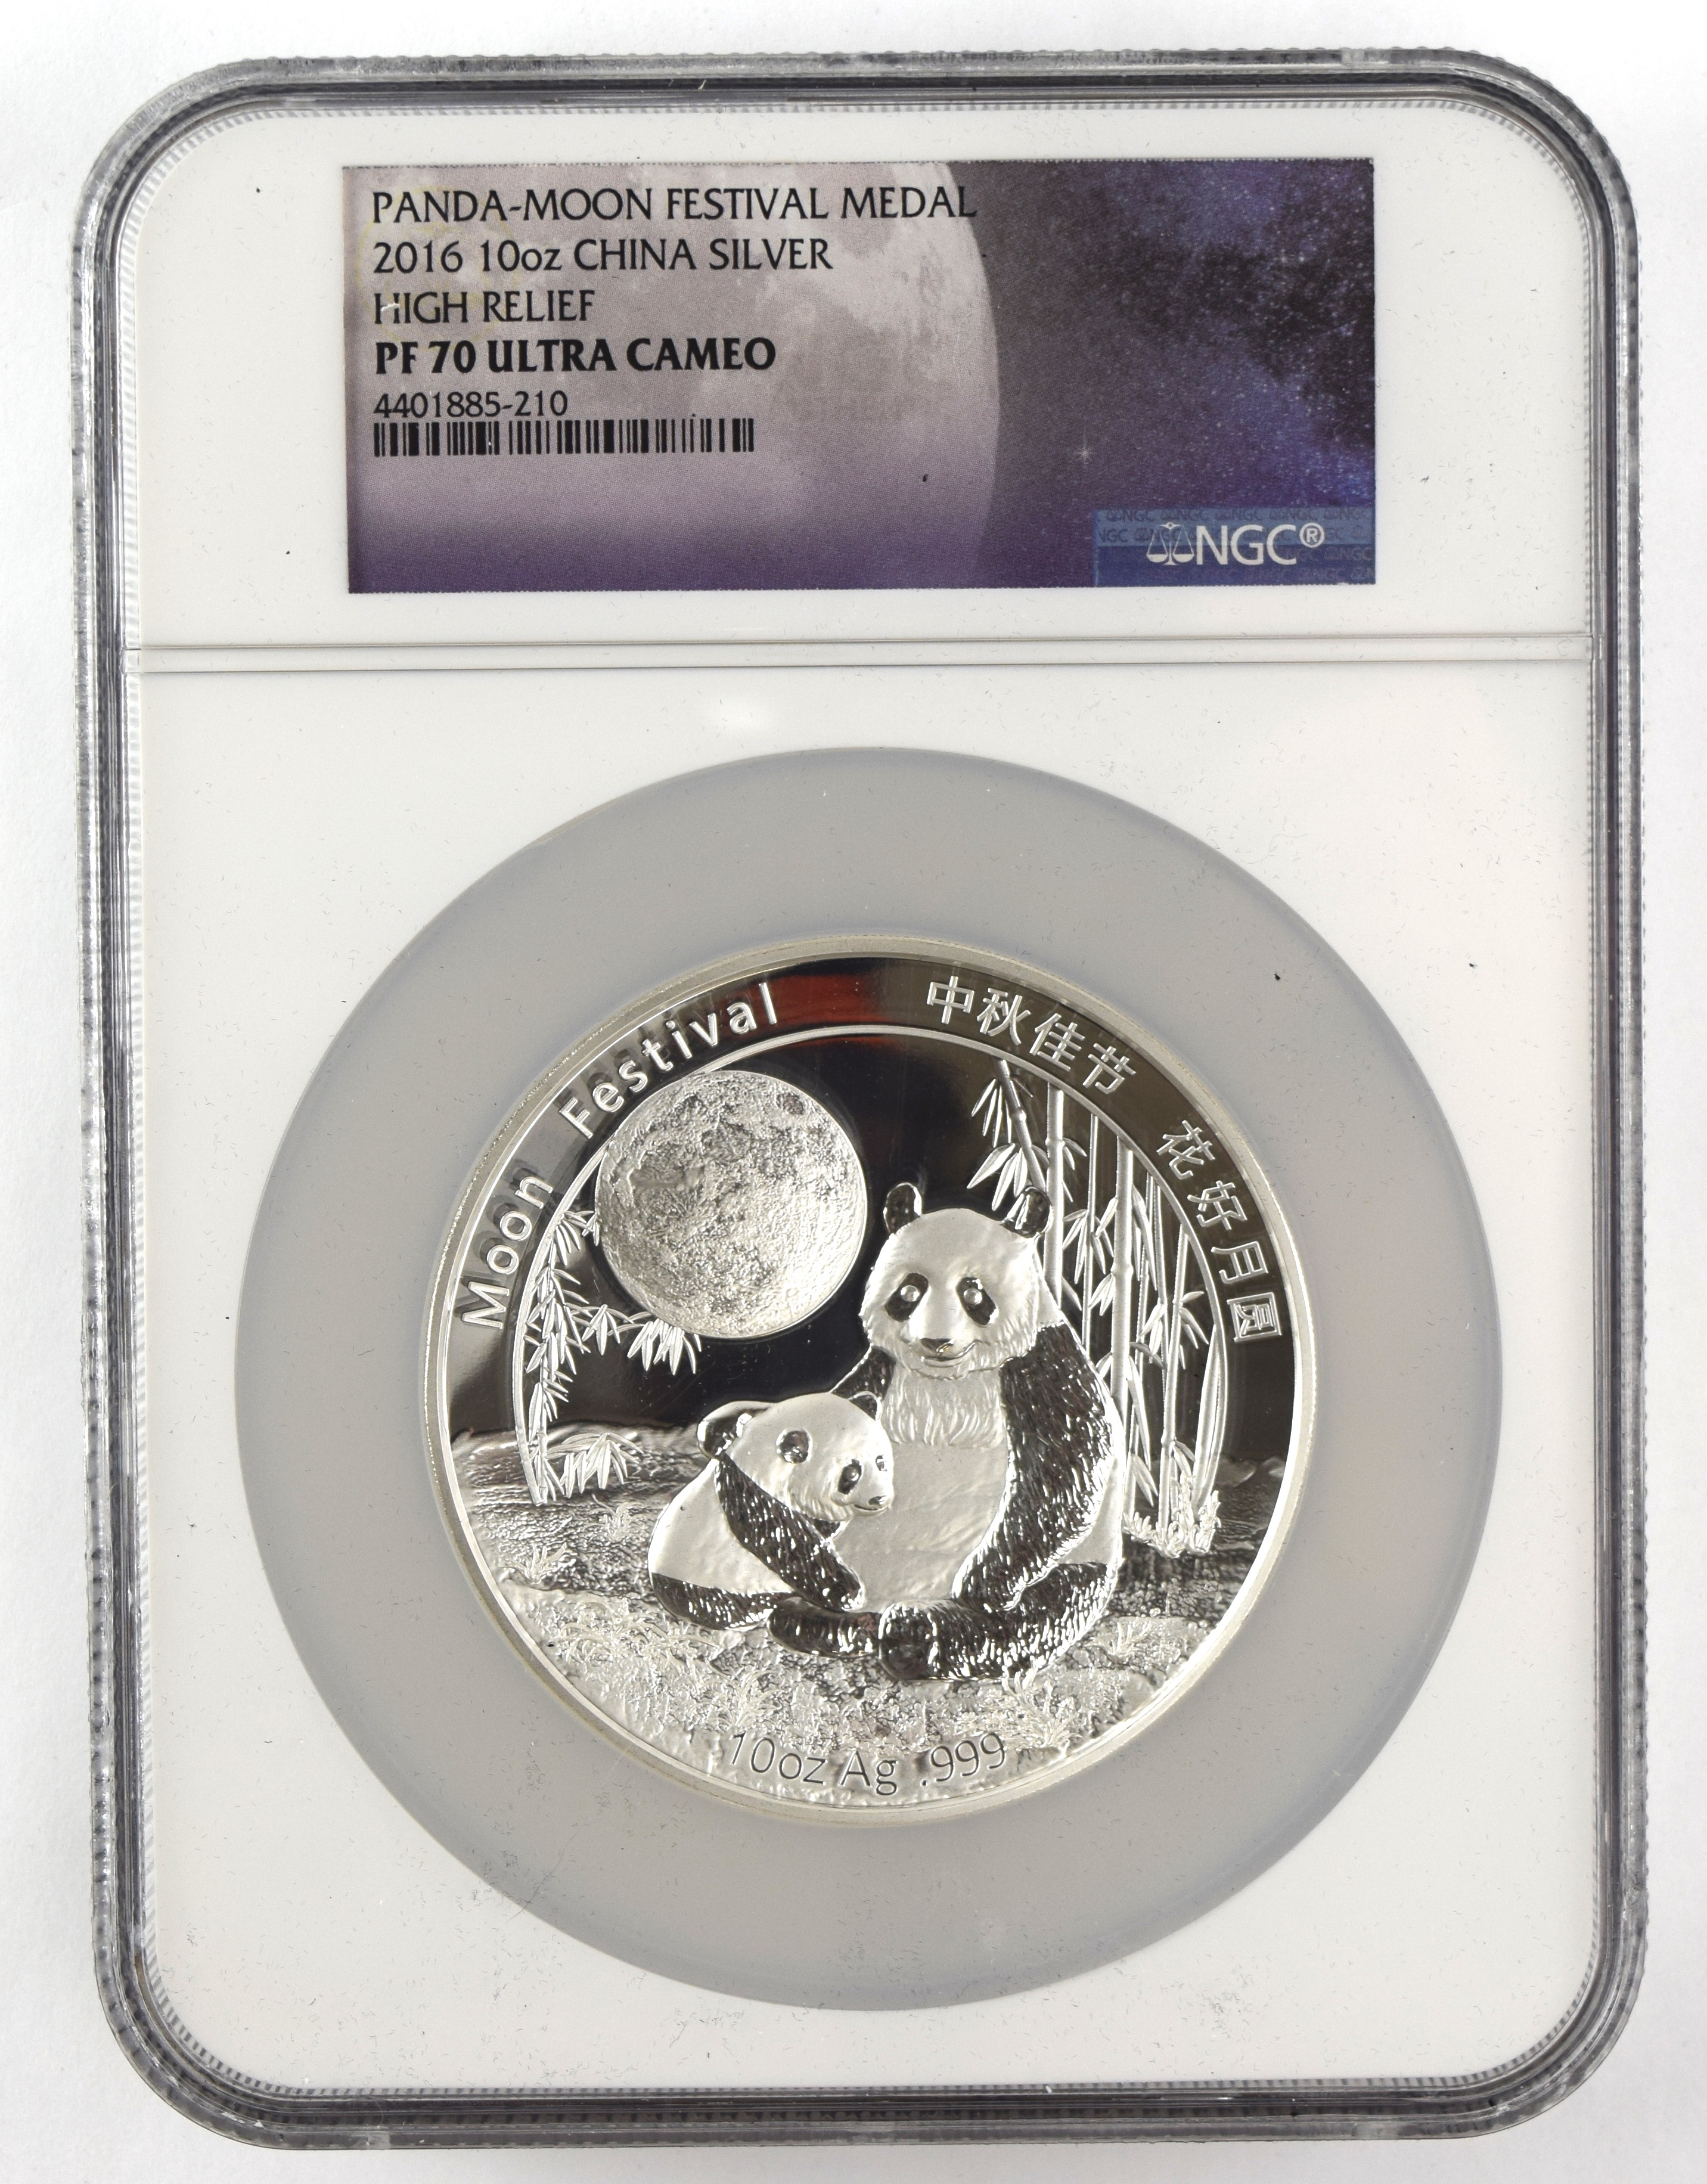 2015 Panda Moon Festival Medal